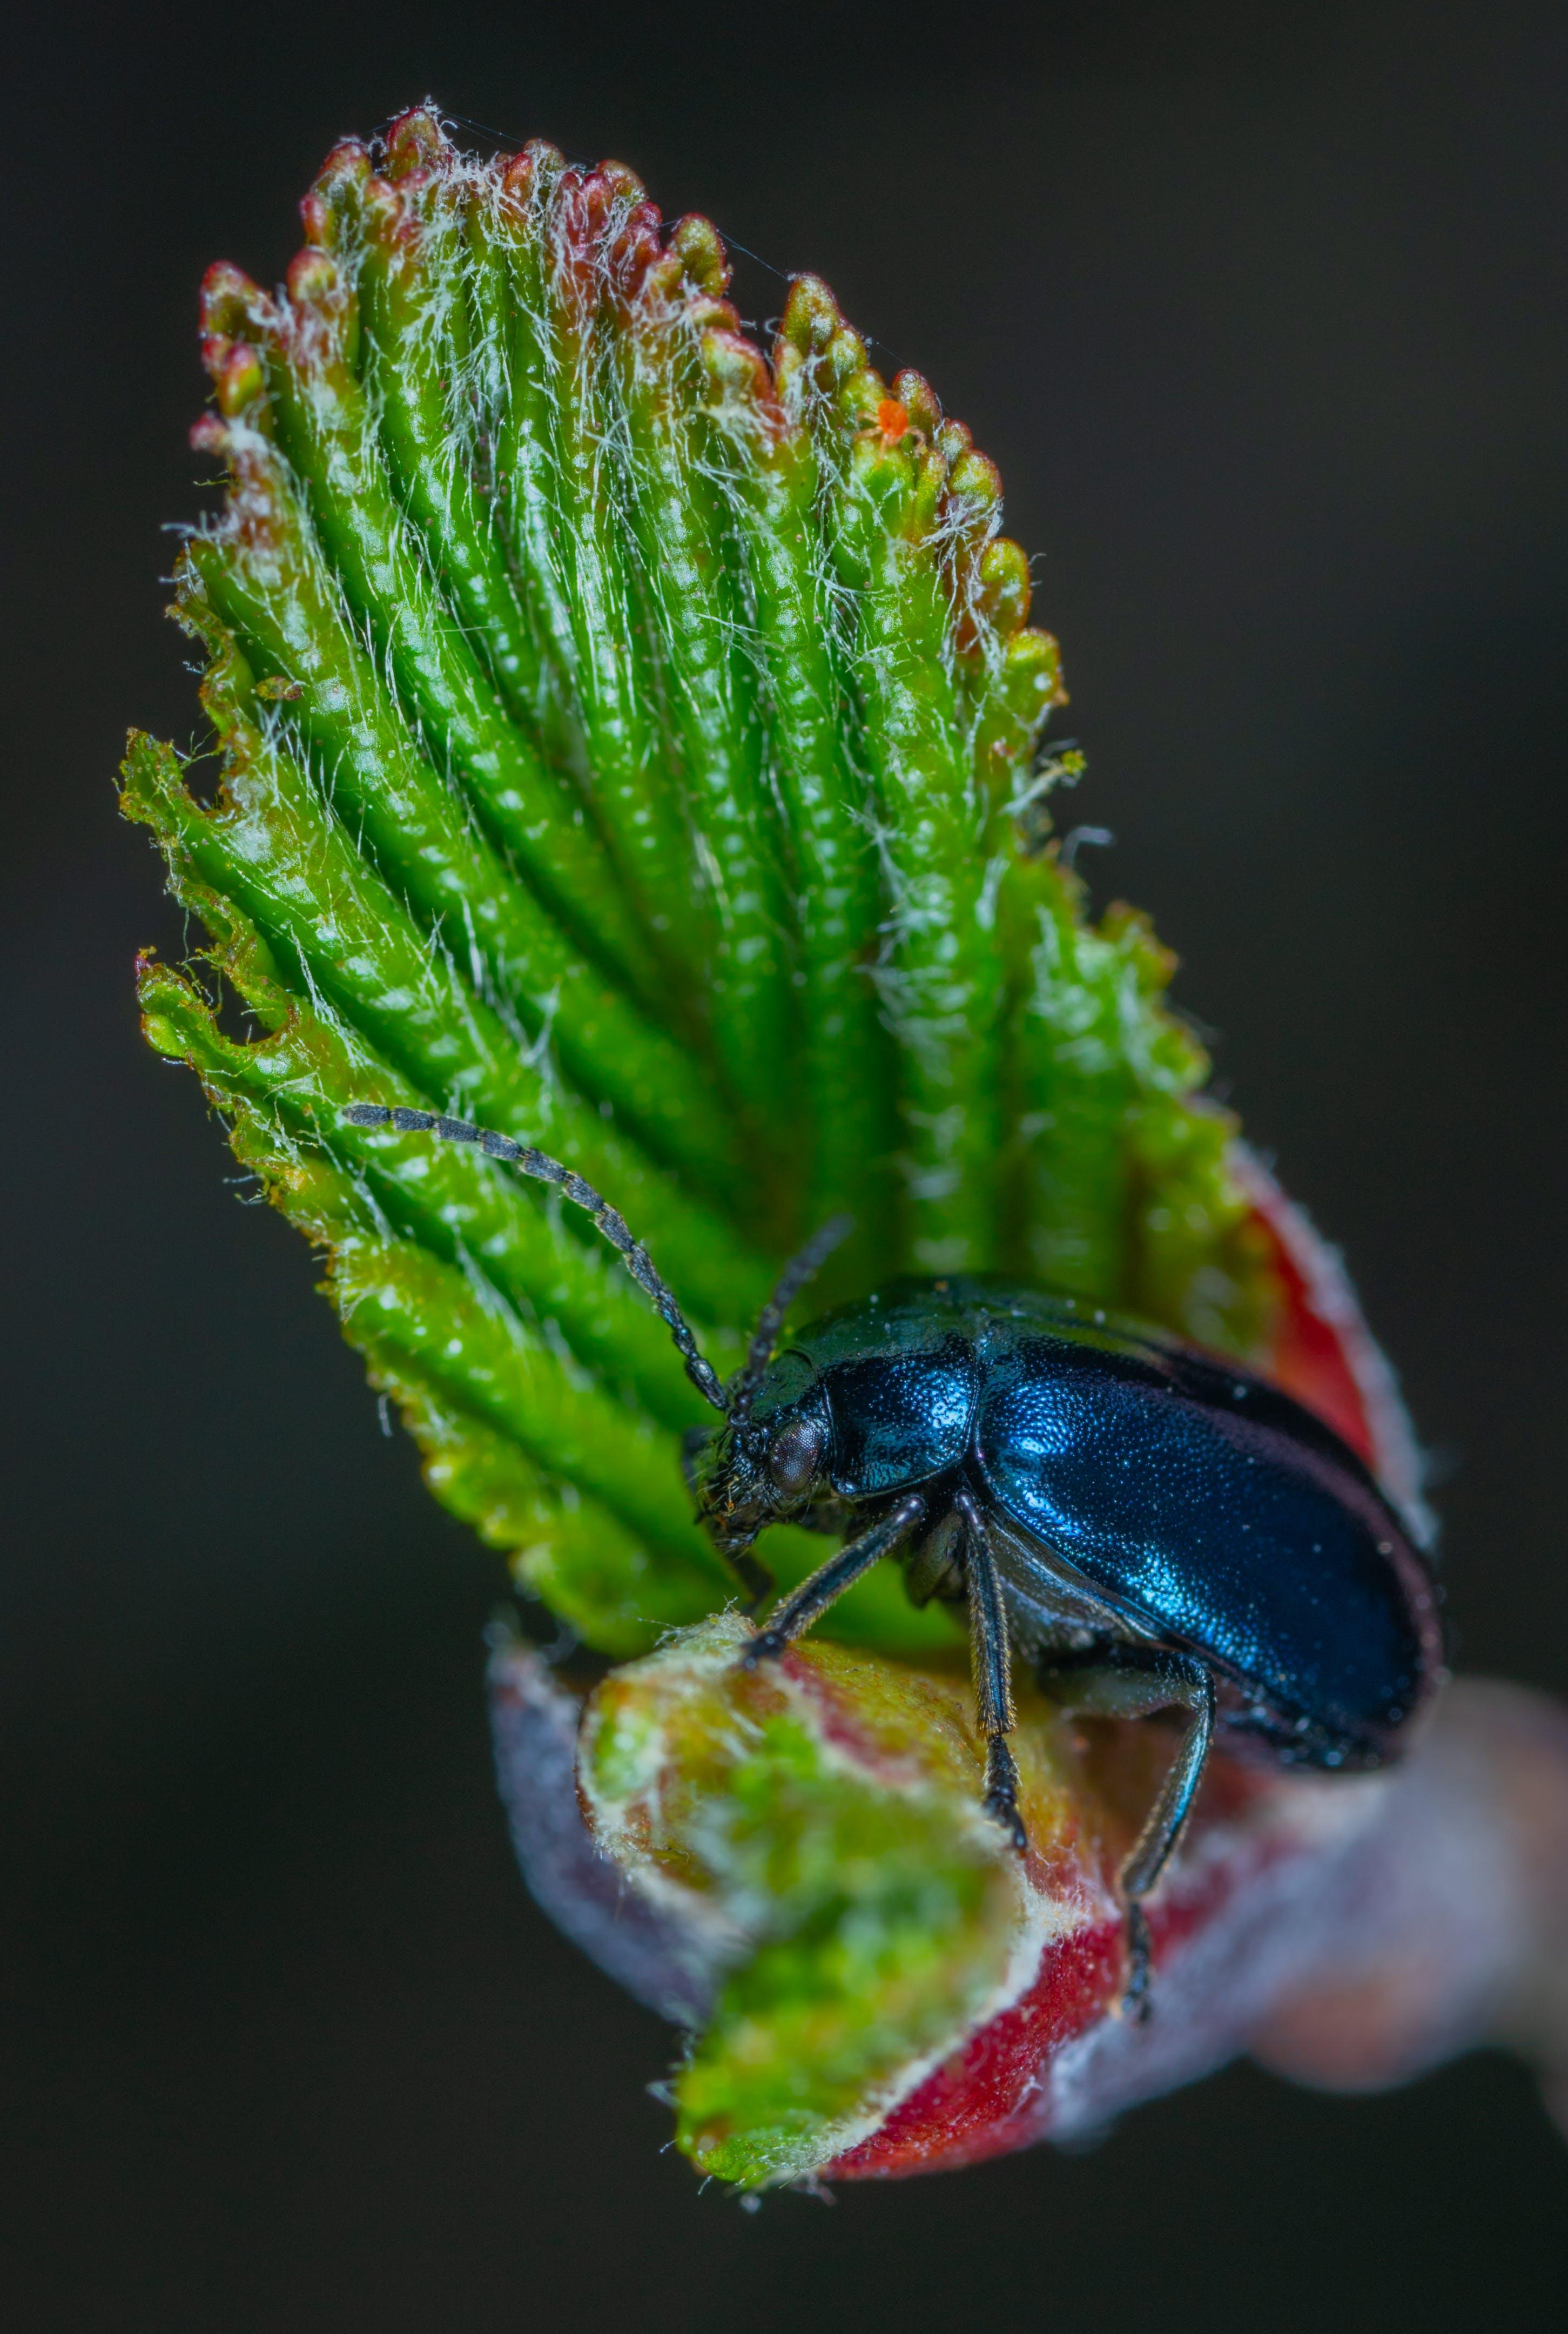 állat, beetle, biológia